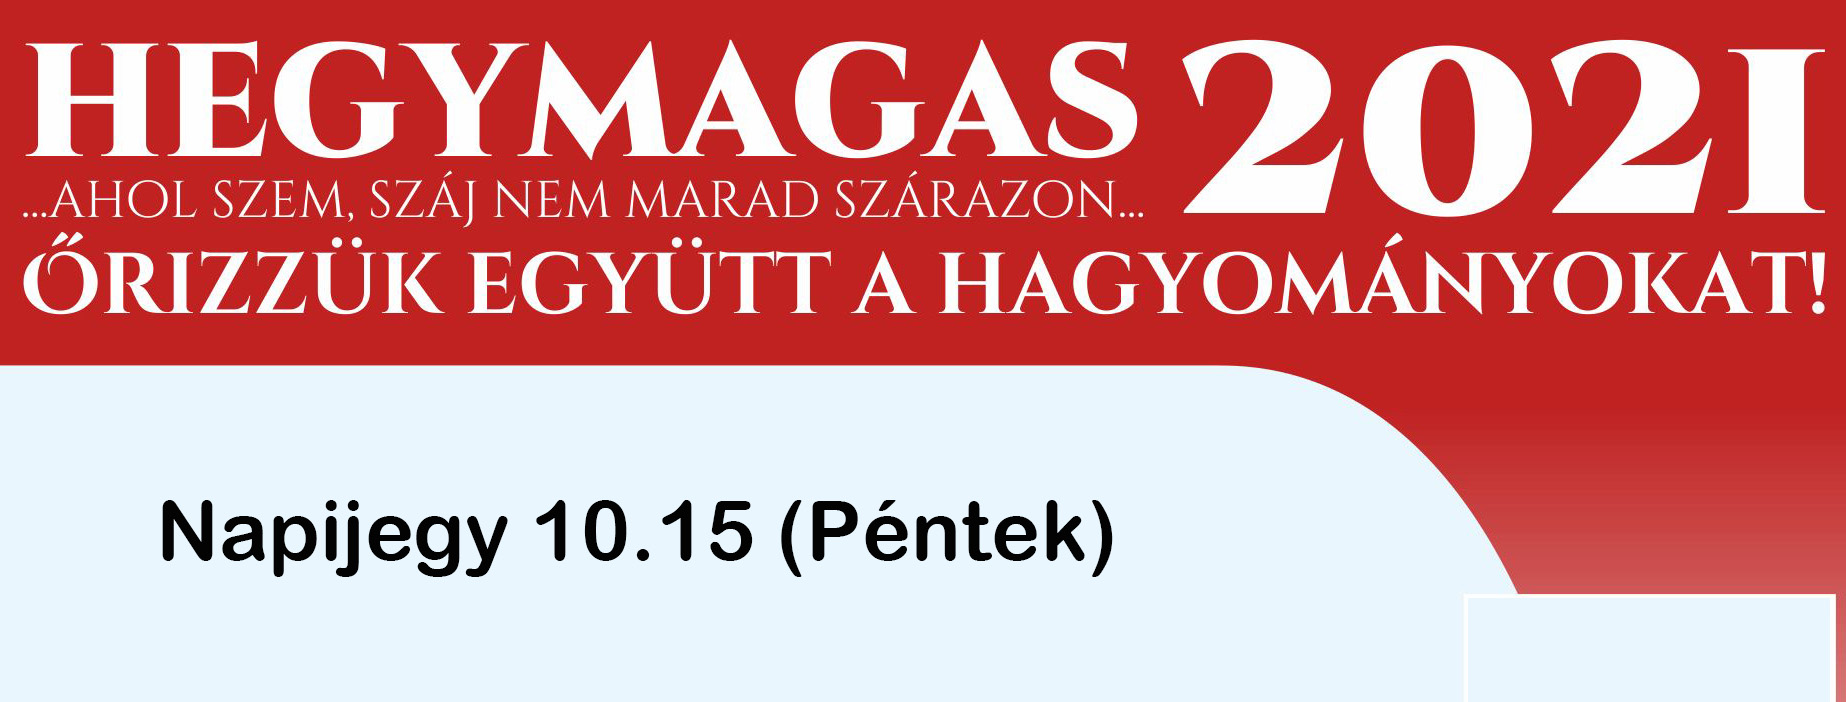 HEGYMAGAS 2021 - Napijegy 10/15